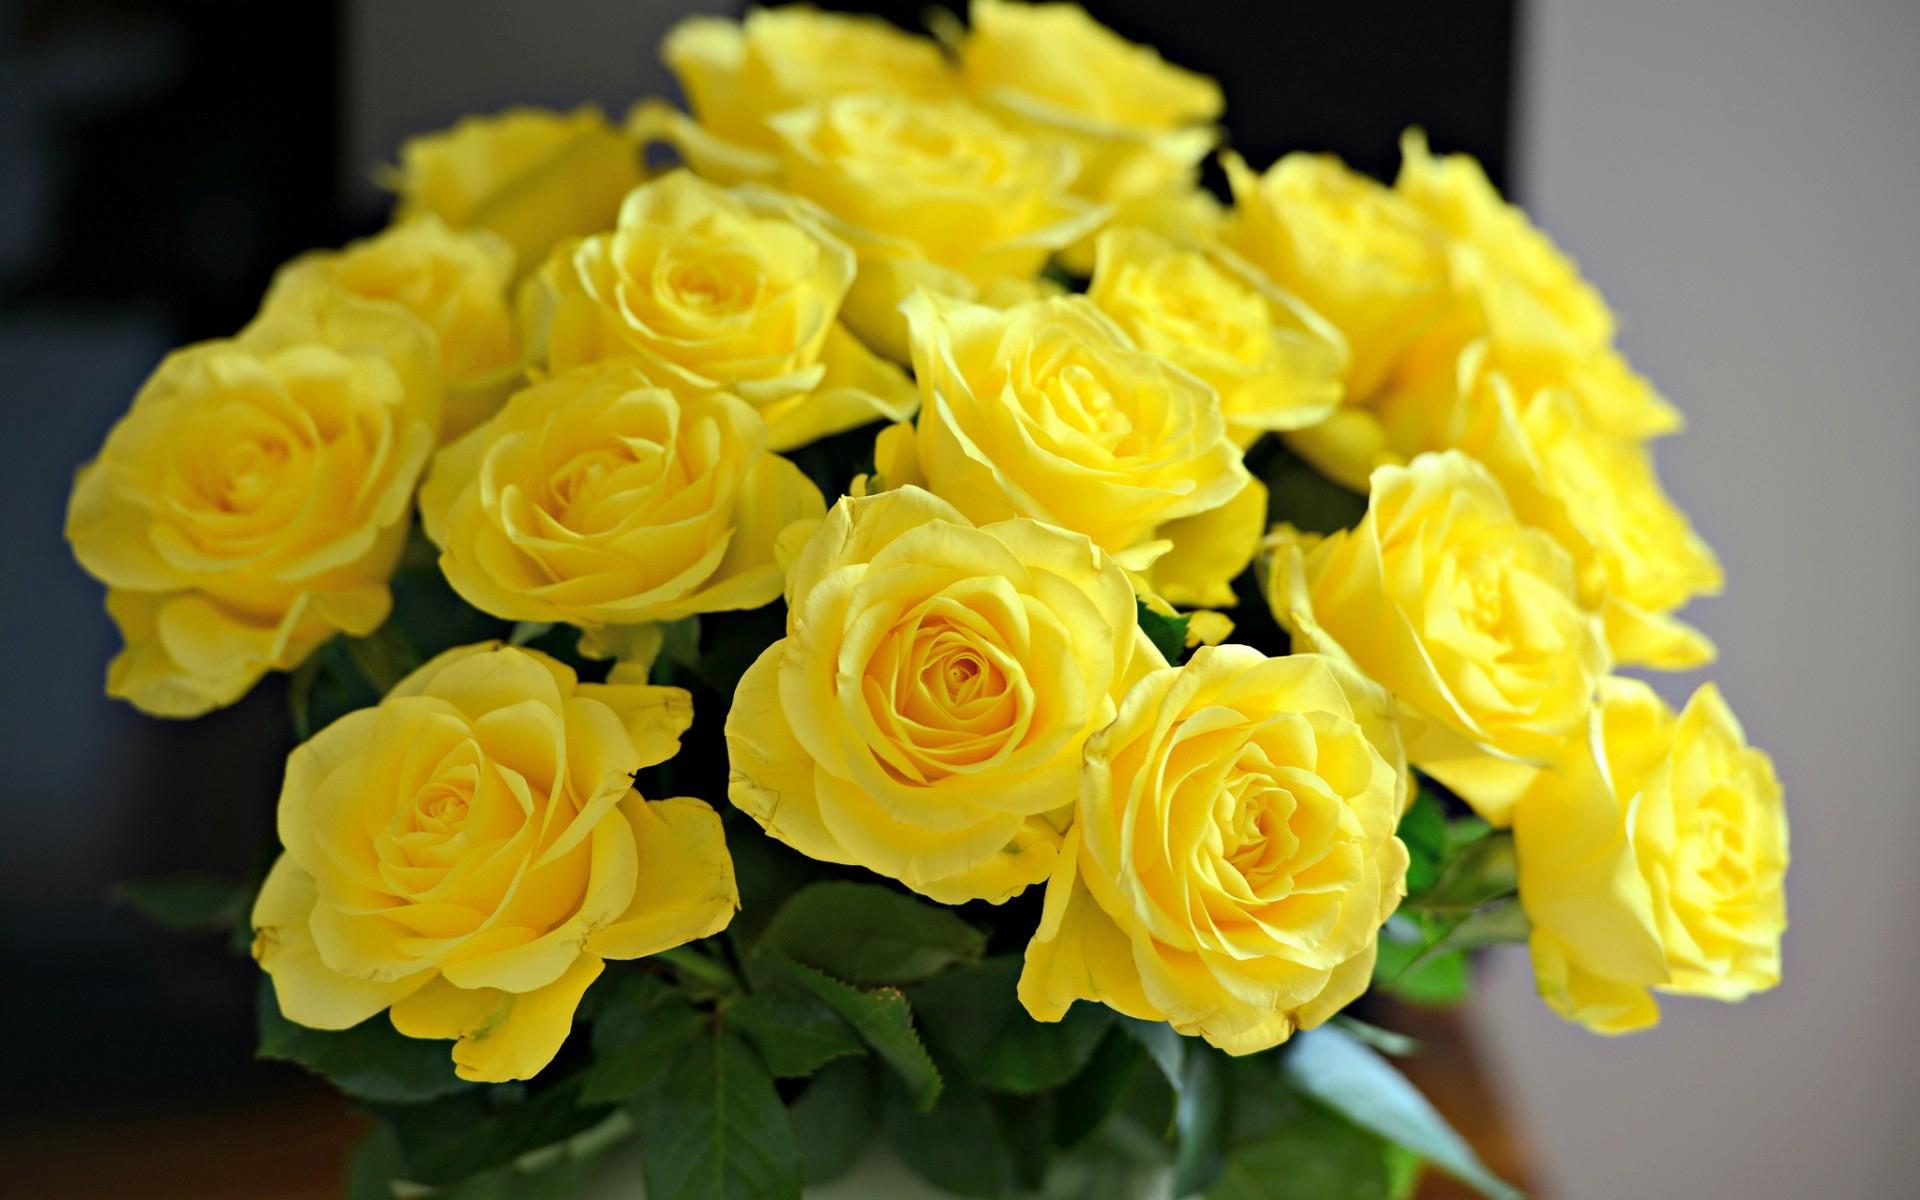 Hd wallpaper yellow rose - Yellow Rose Wallpaper Hd Wallpaper